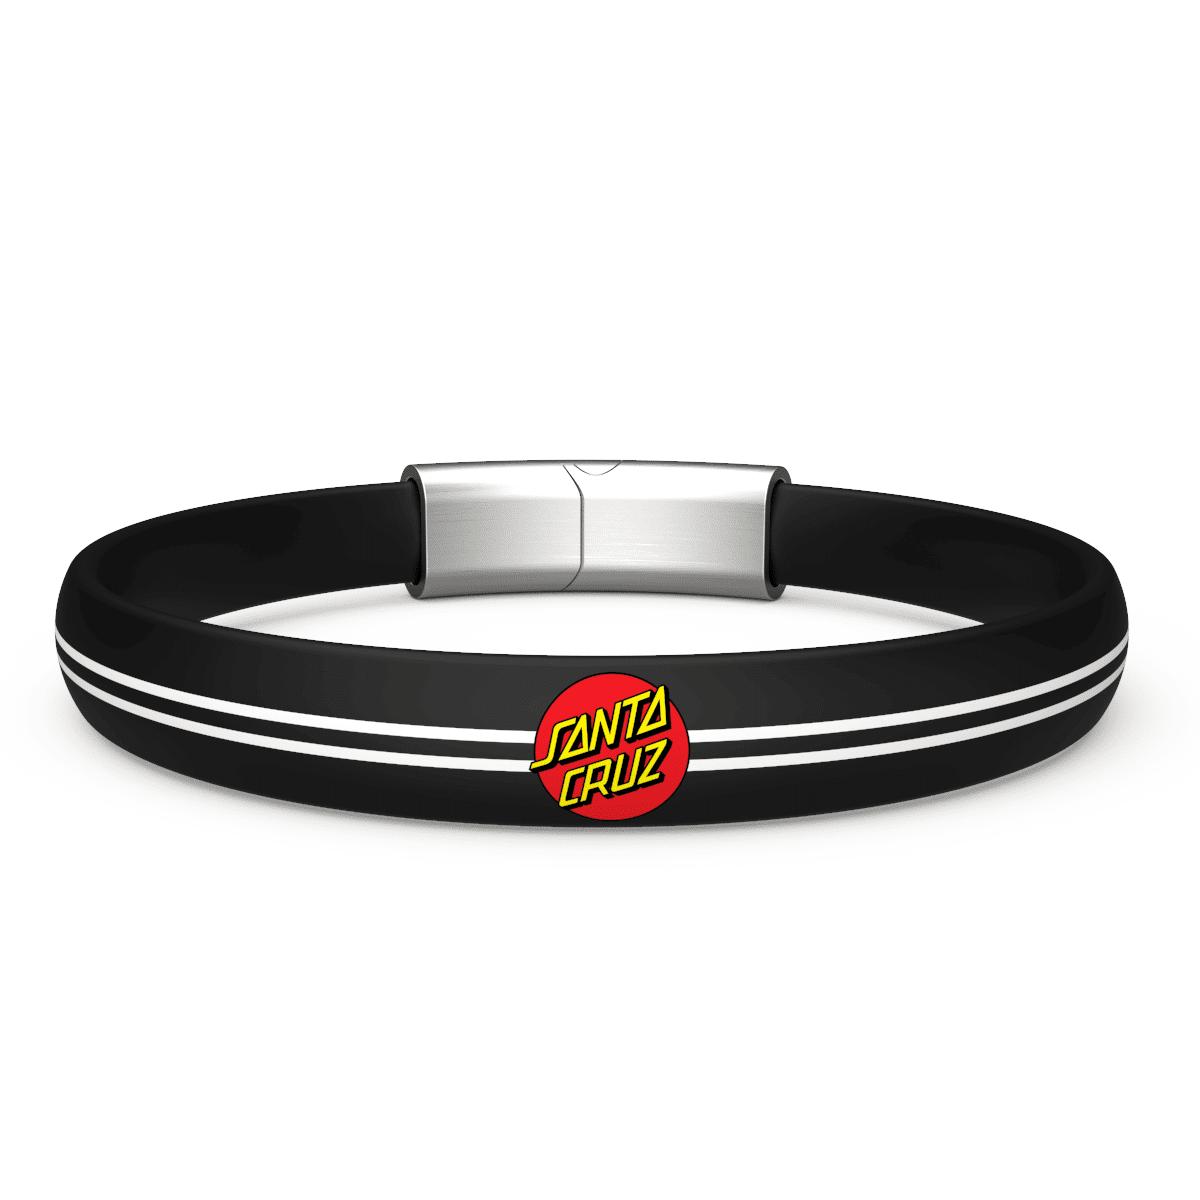 EnsoRings Santa Cruz Silicone Bracelet - Classic Dot Black - Silver/Brushed